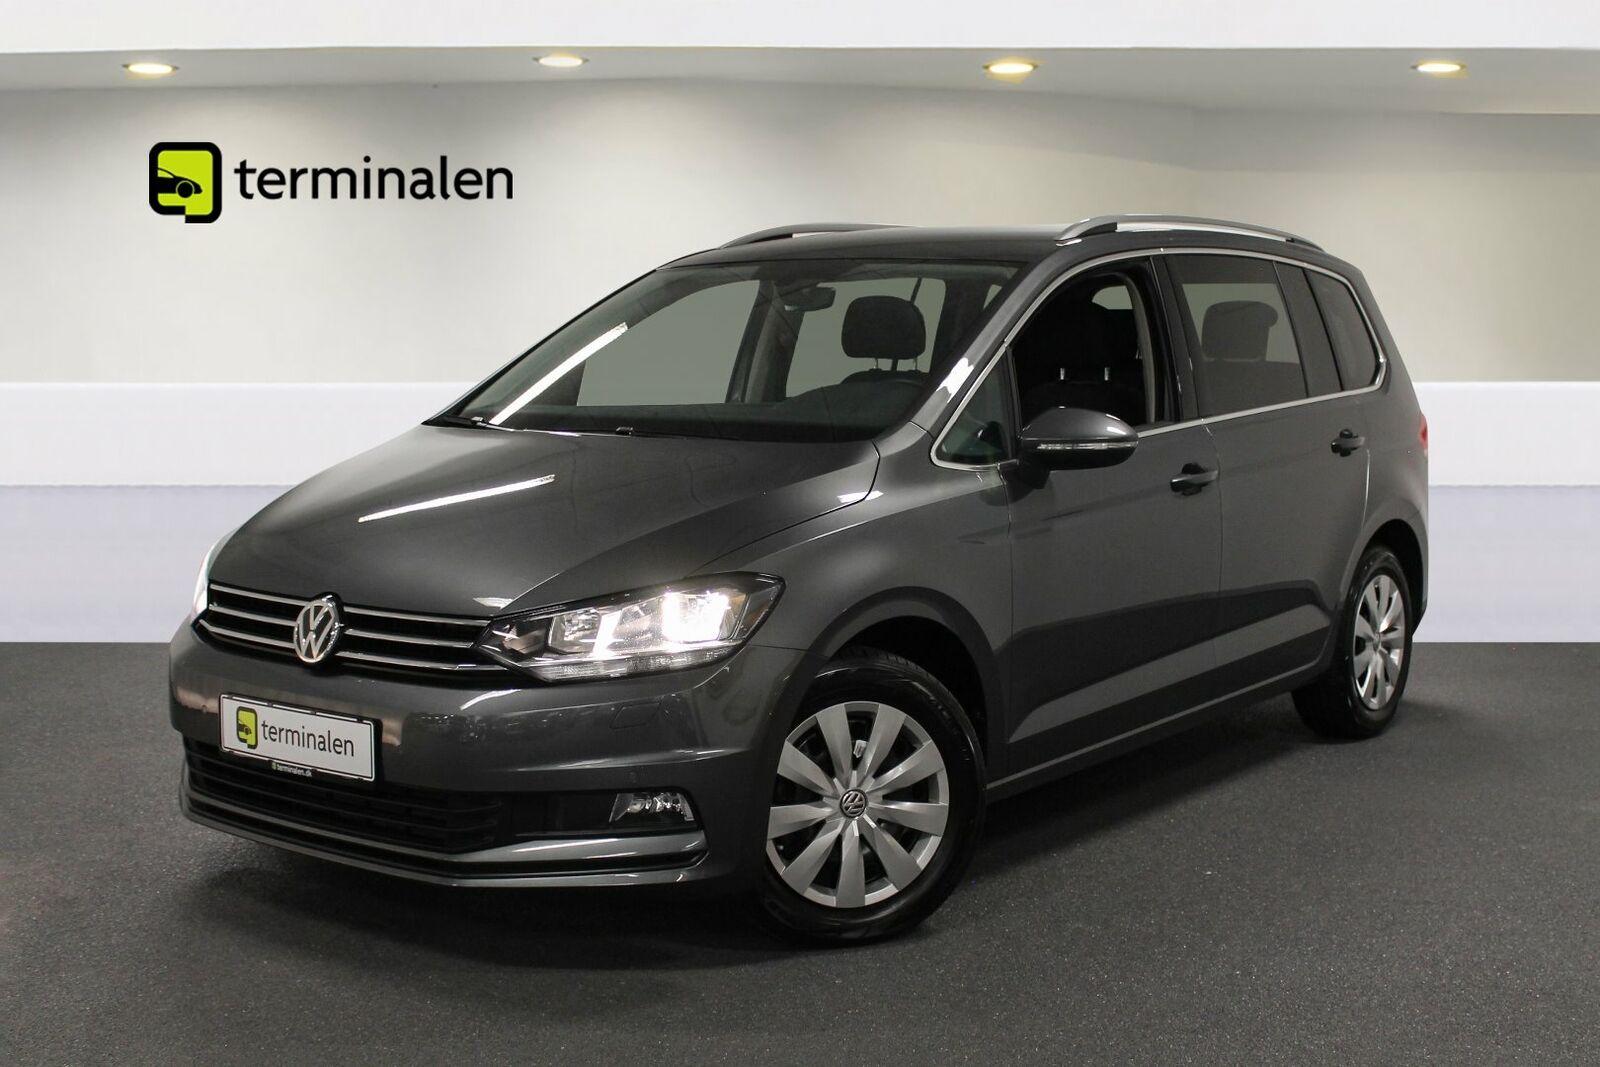 VW Touran 1,2 TSi 110 Comfortline 7prs 5d - 269.800 kr.